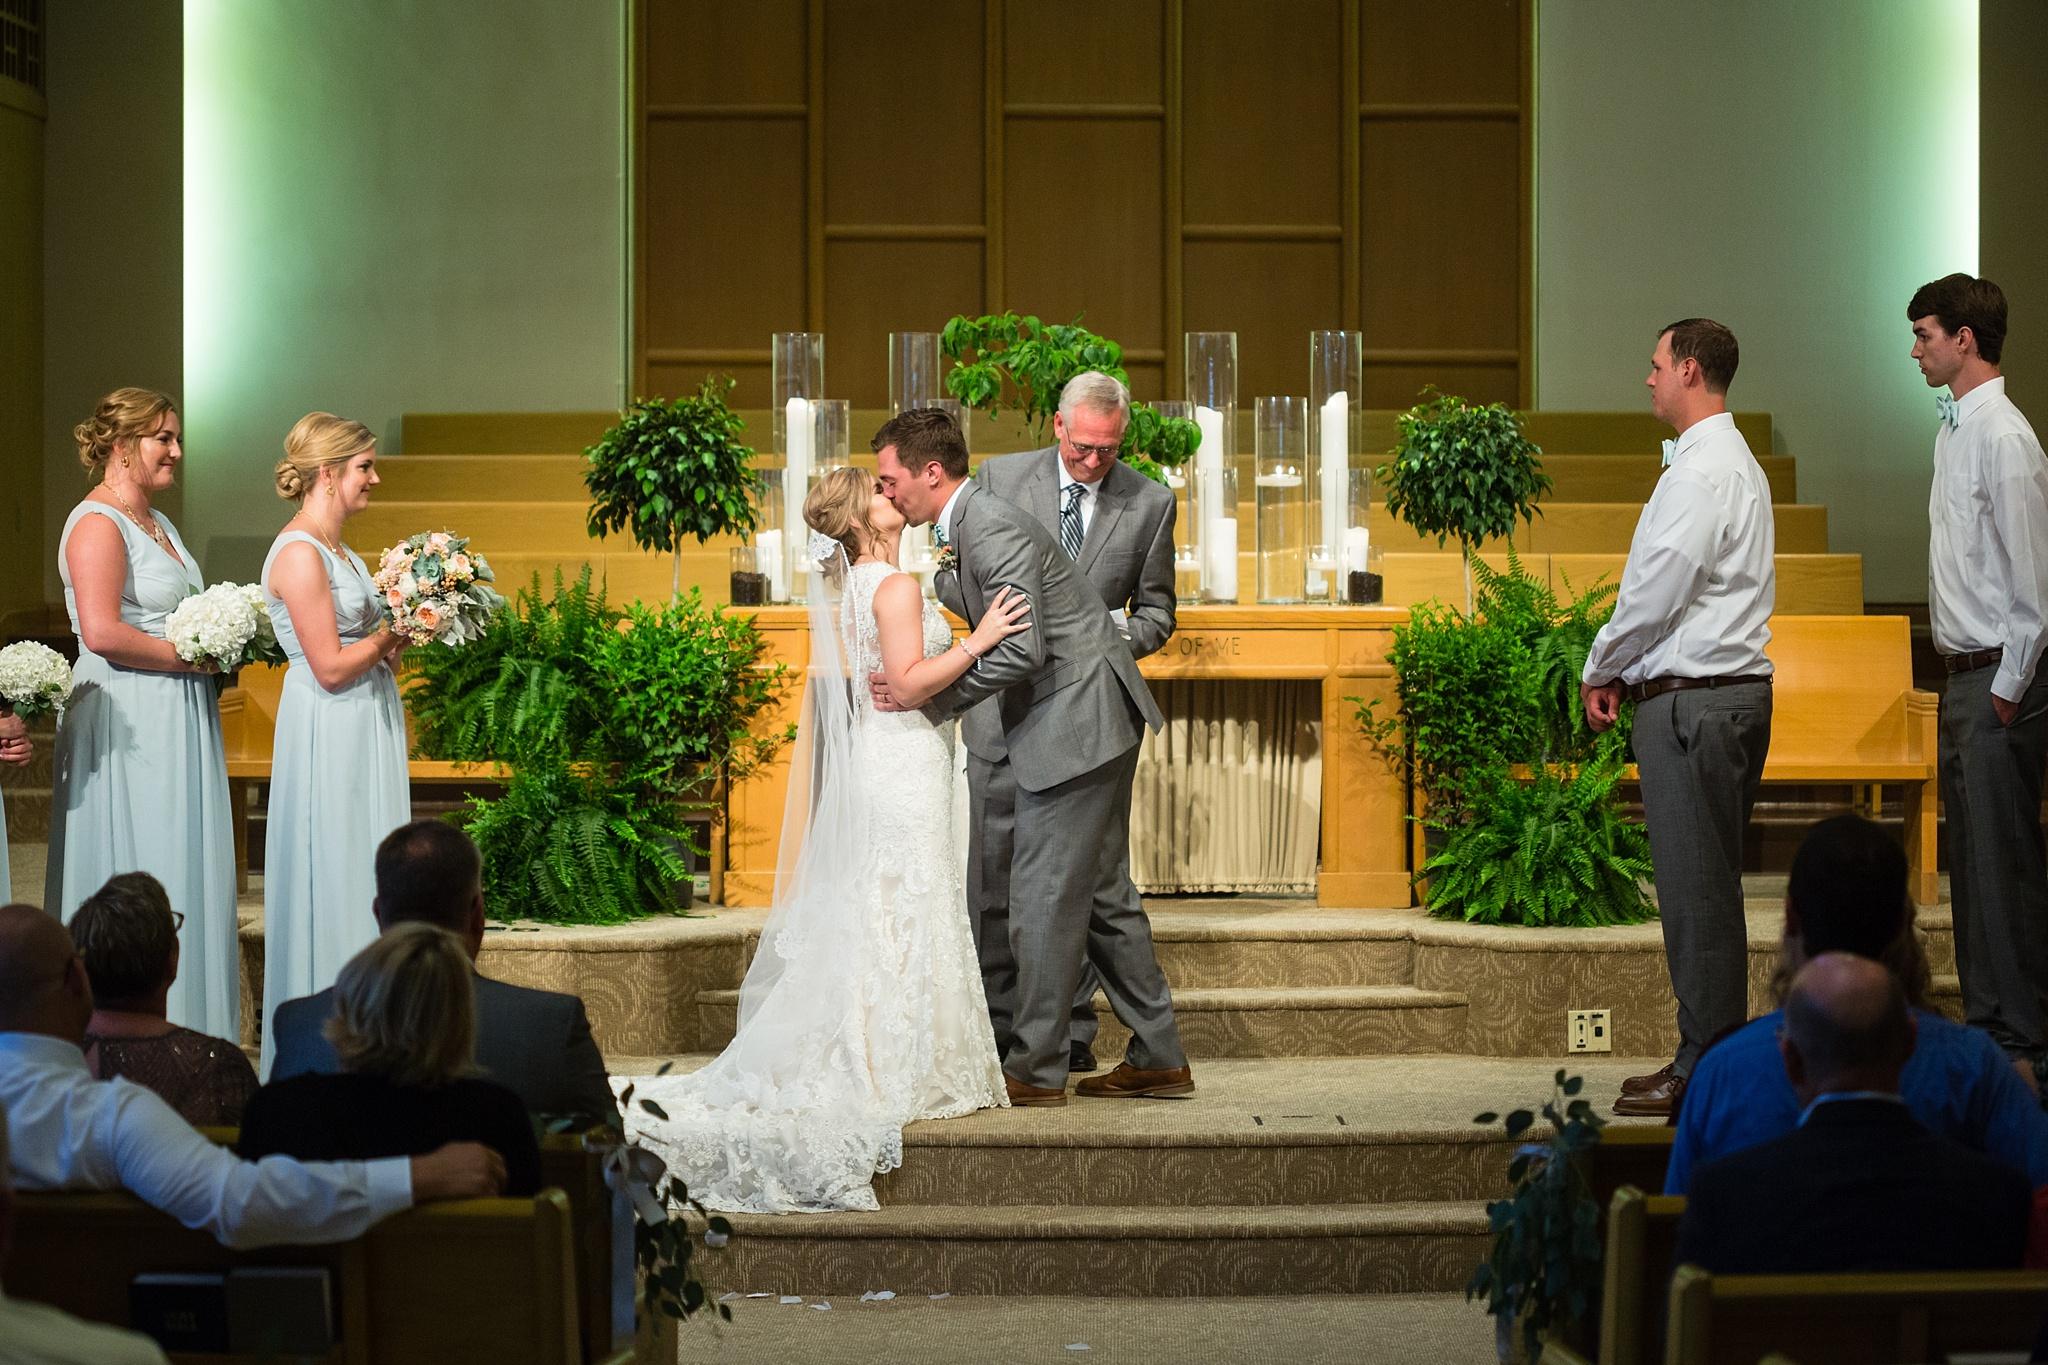 Mandi_Jack_Treehouse_Grand_Rapids_Wedding_0049.jpg